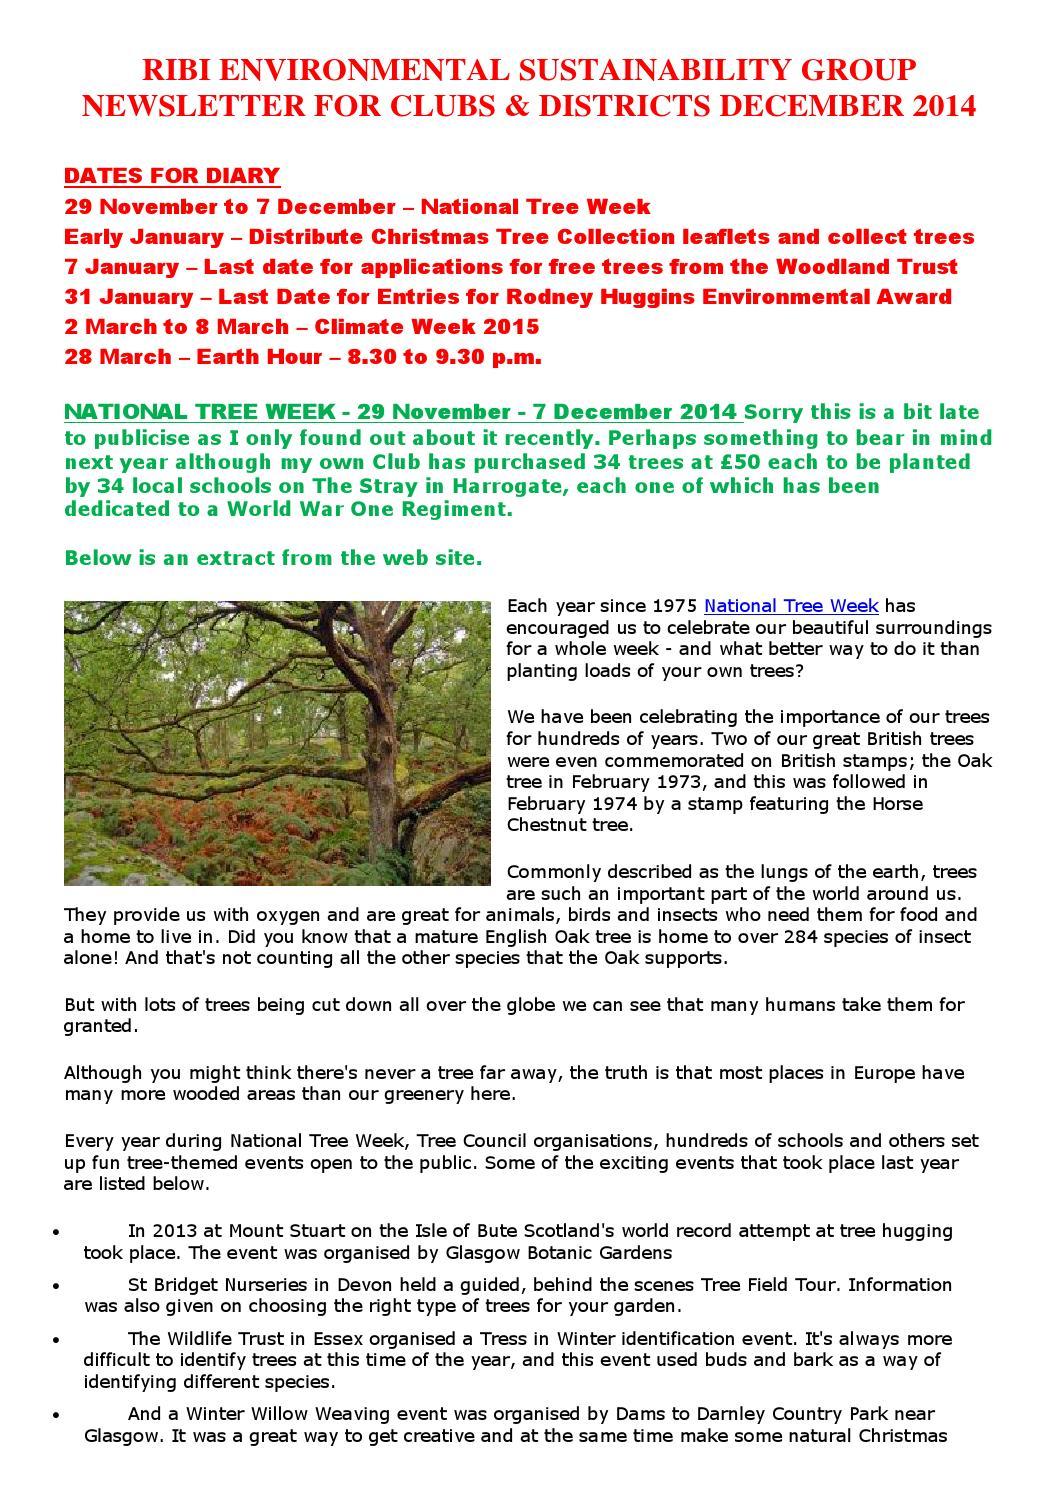 Environment newsletter december 2014 by James Lovatt Rotary - issuu